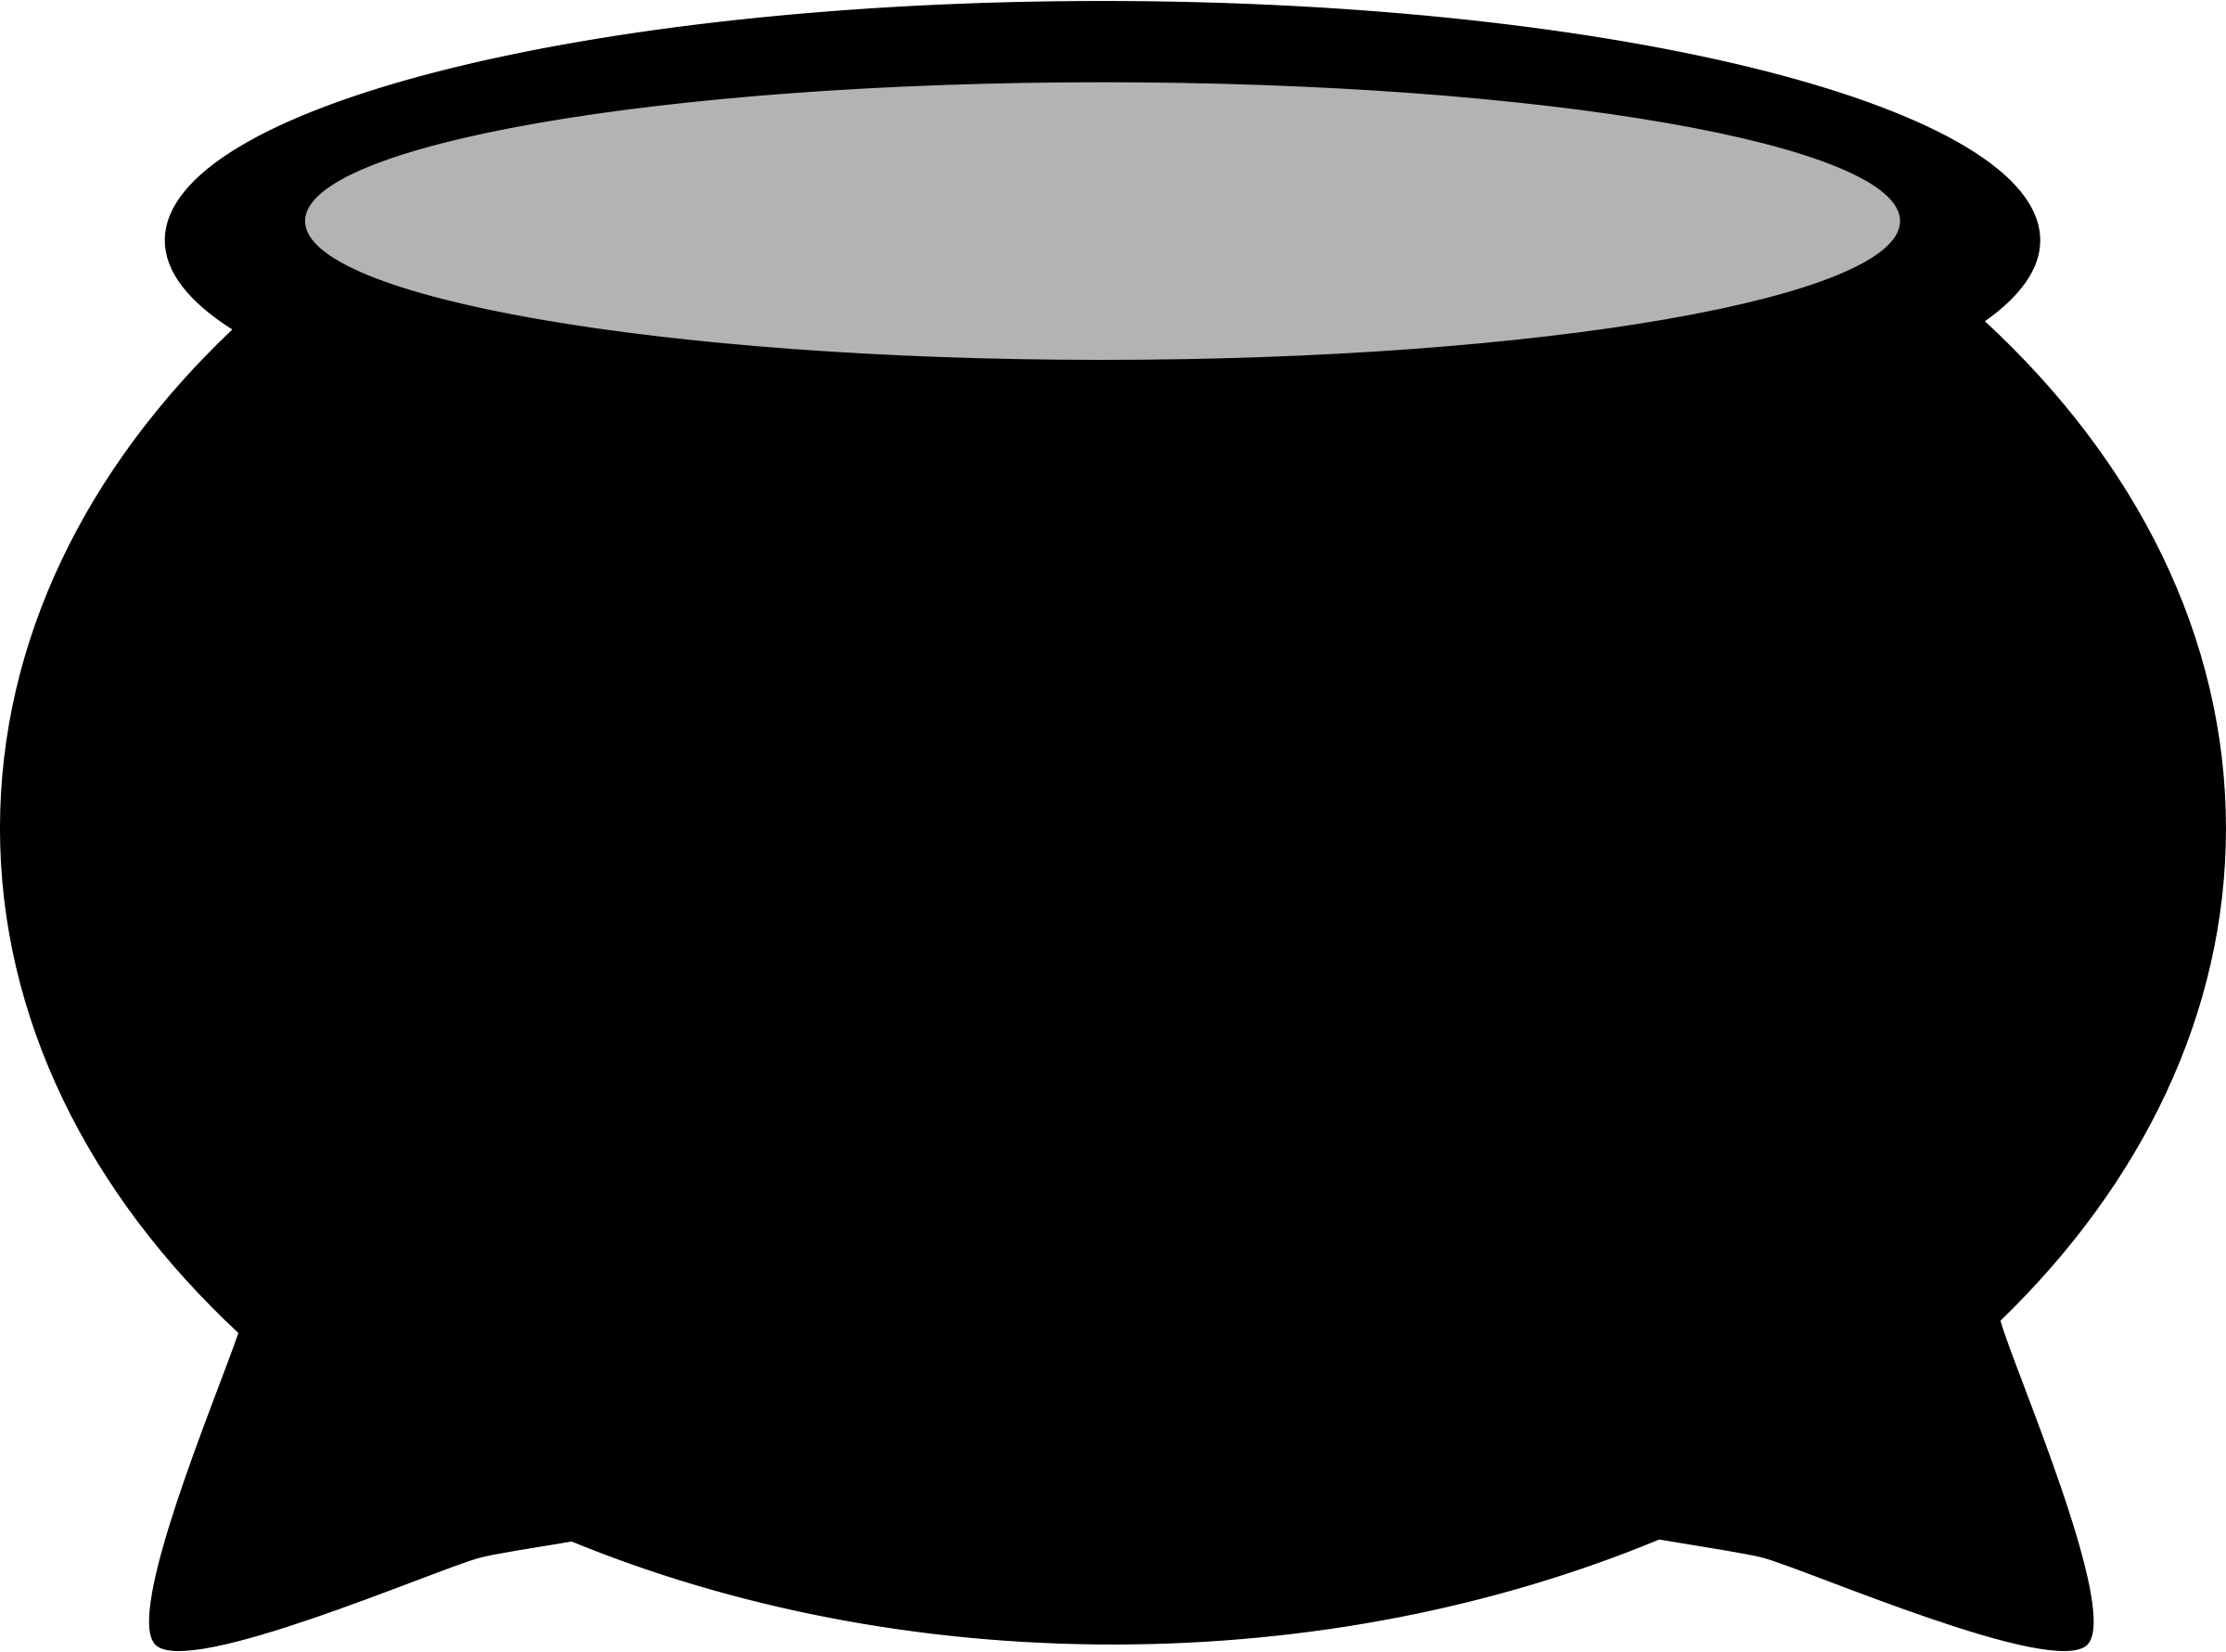 Pot Of Gold Clipart-pot of gold clipart-7